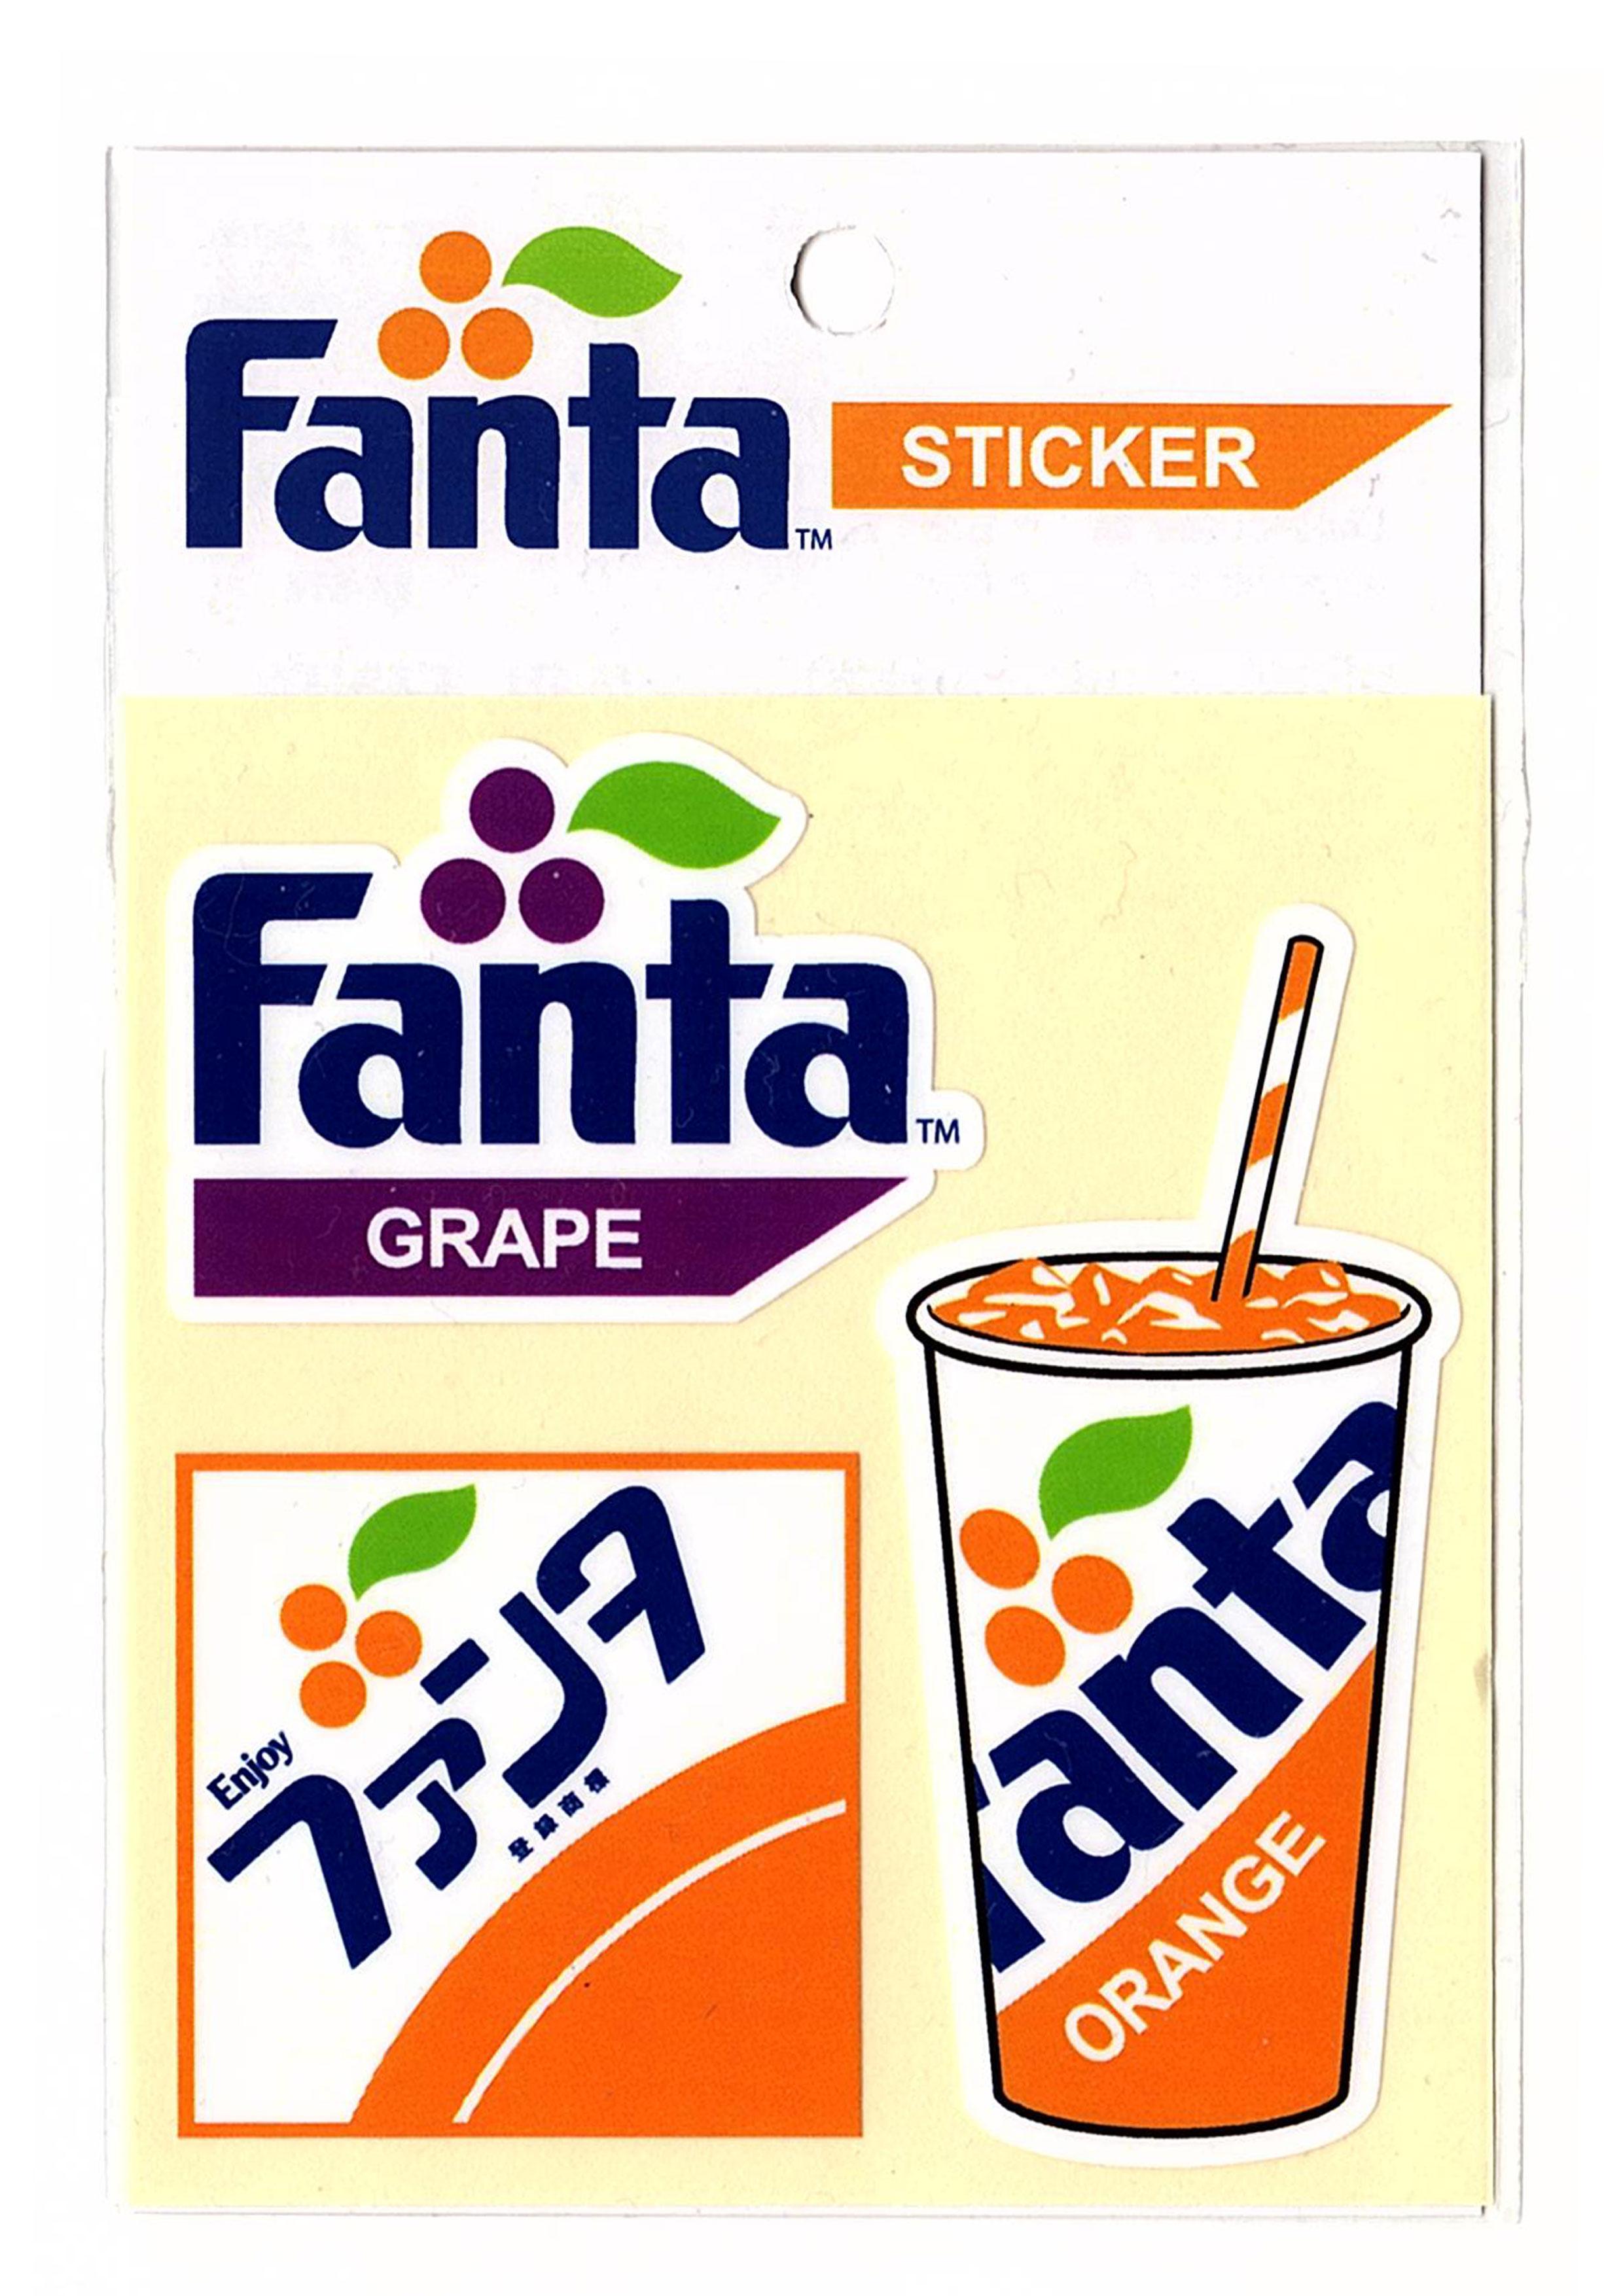 Fanta☆FA-ST27☆ファンタ☆Fanta Value Sticker ファンタ バリュー ステッカー ファンタオレンジ ファンタグレープ